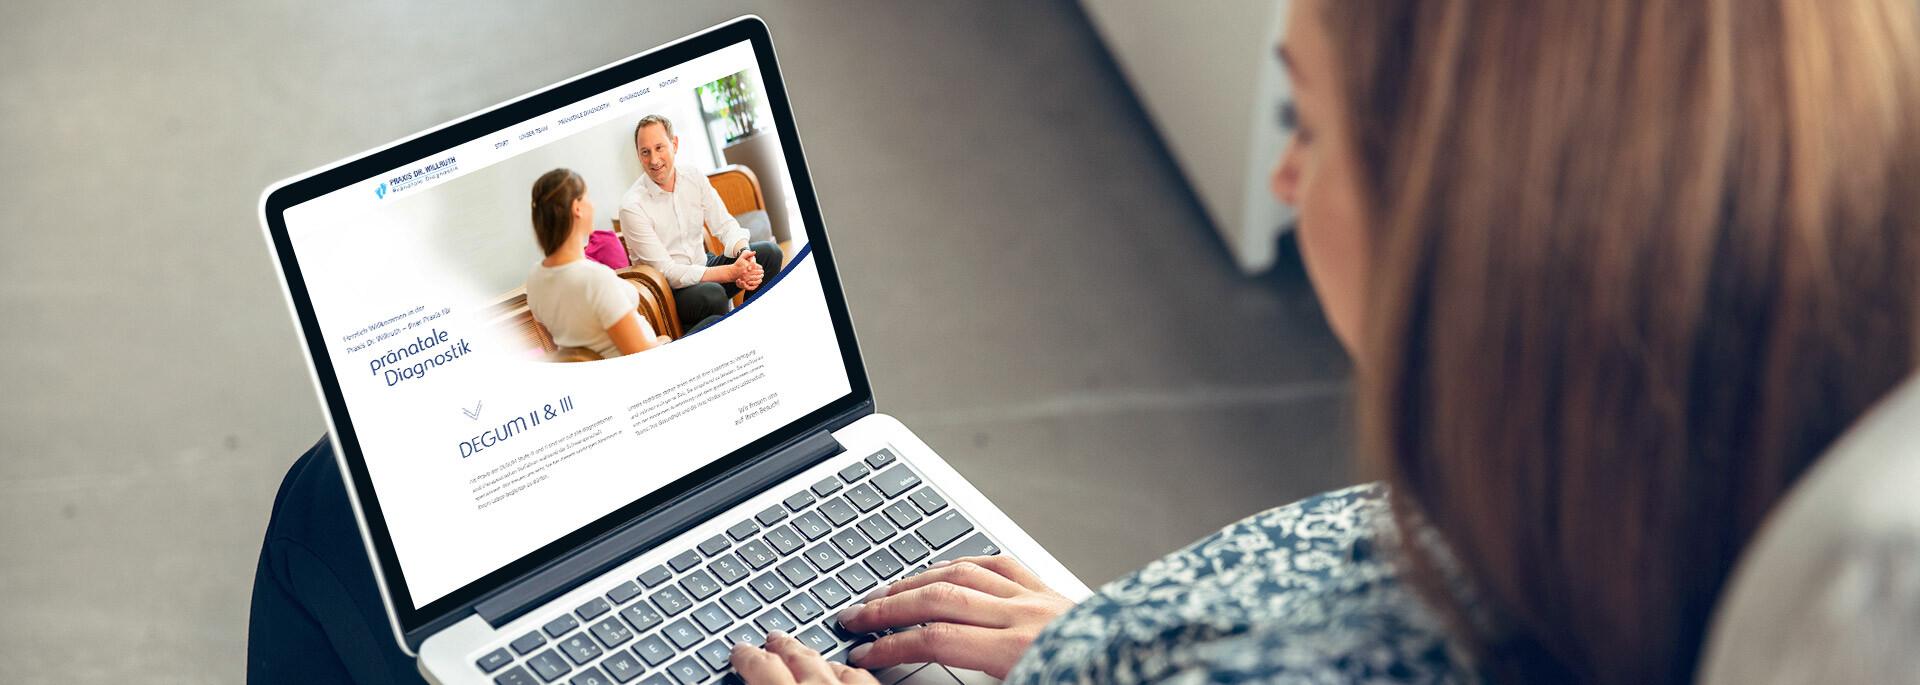 Praxiswebsite mit KIMDESIGN